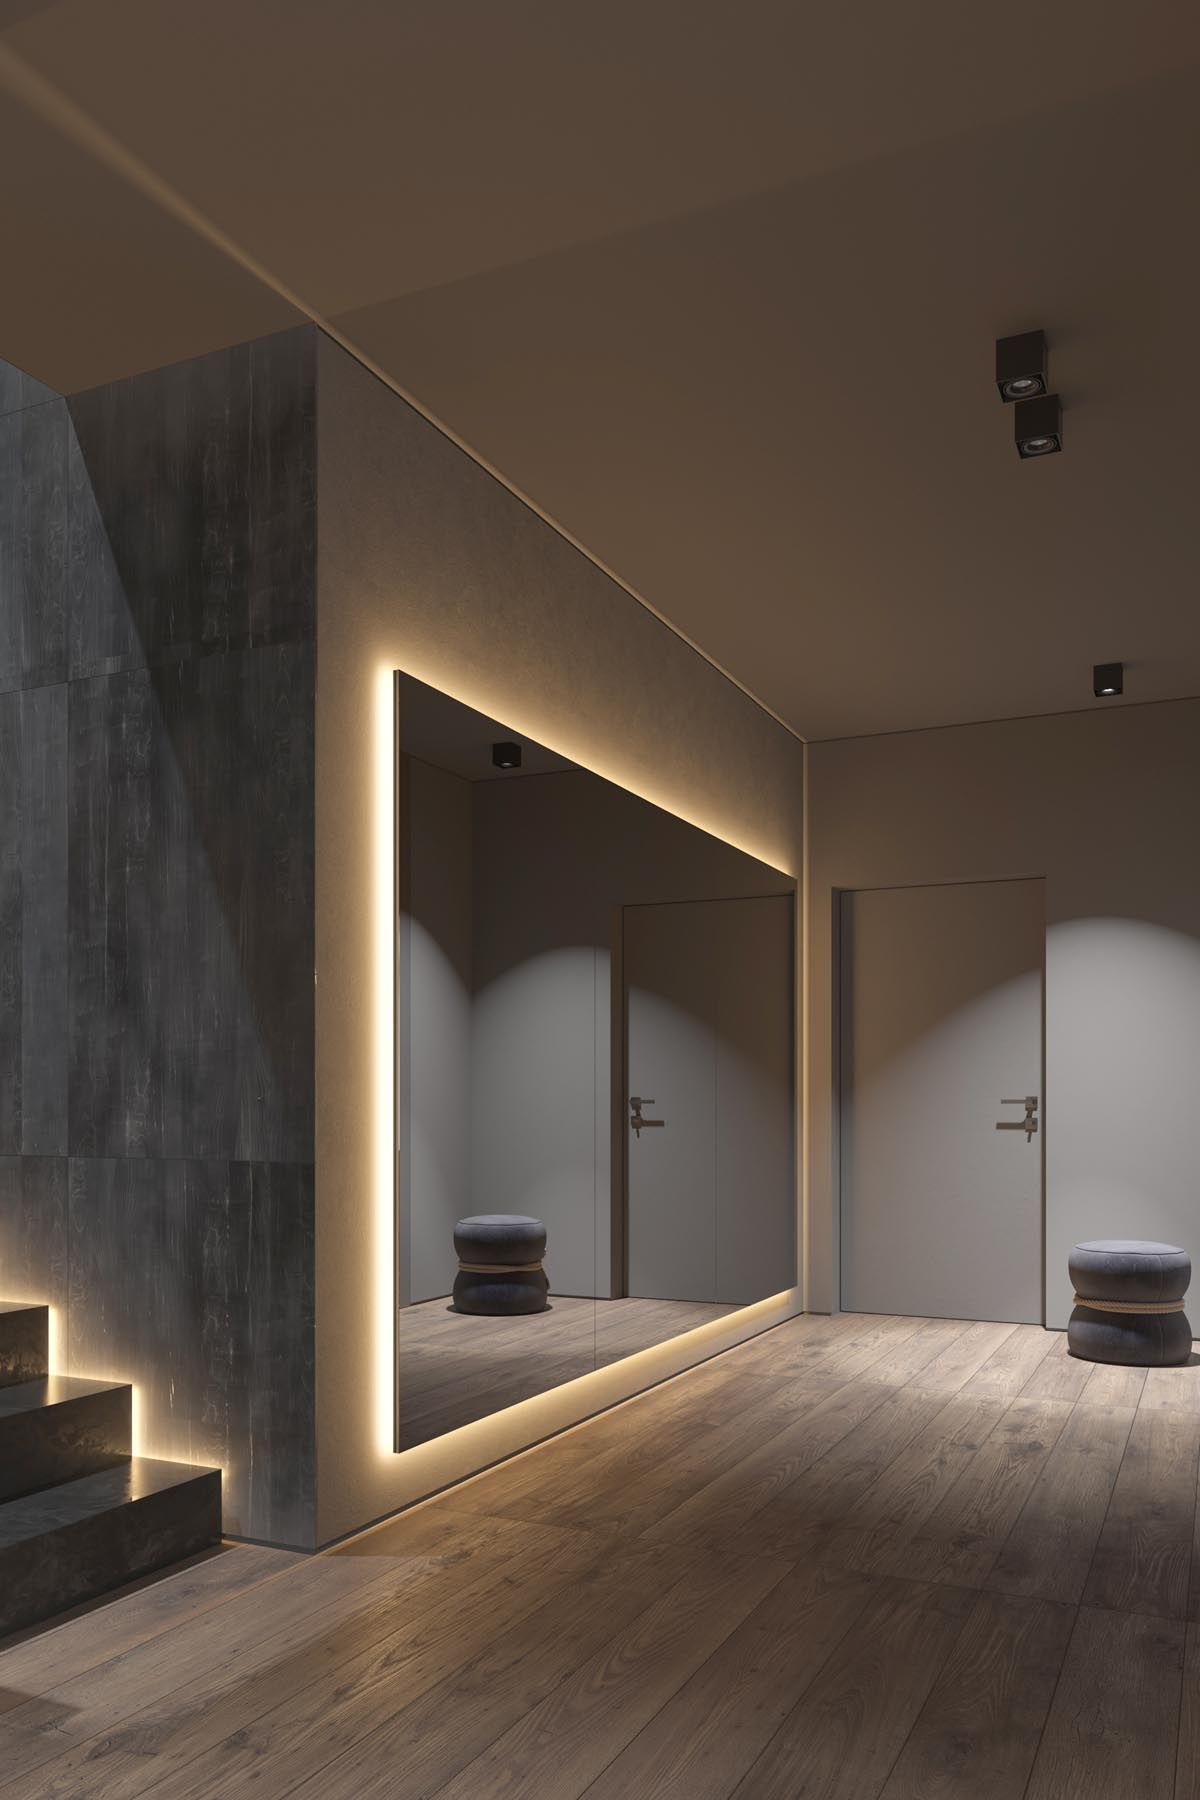 house led lighting. Dark Grey Home Decor With Warm LED Lighting | Pinterest - Interieurontwerp, Sportschool En Moderne Architectuur House Led